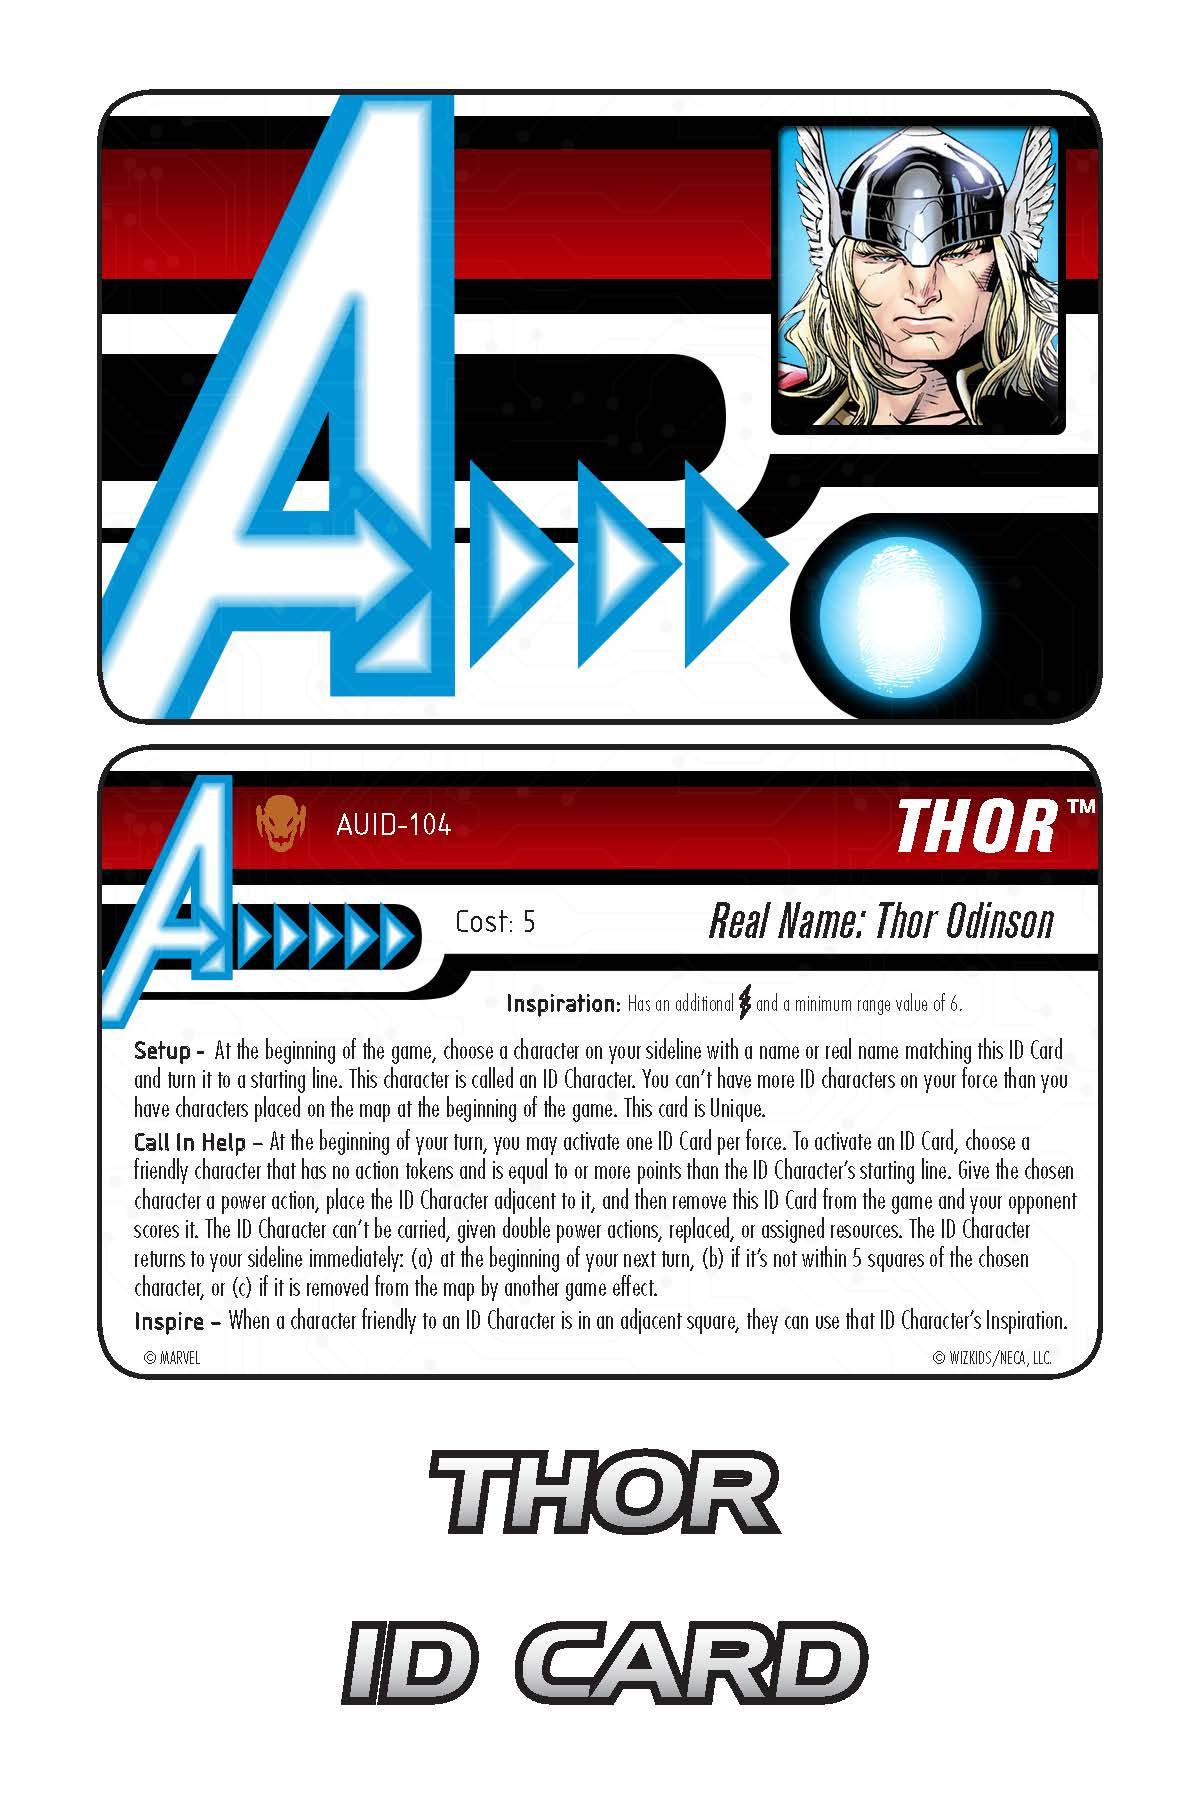 Marvel HeroClix: Avengers ID Card- Thor